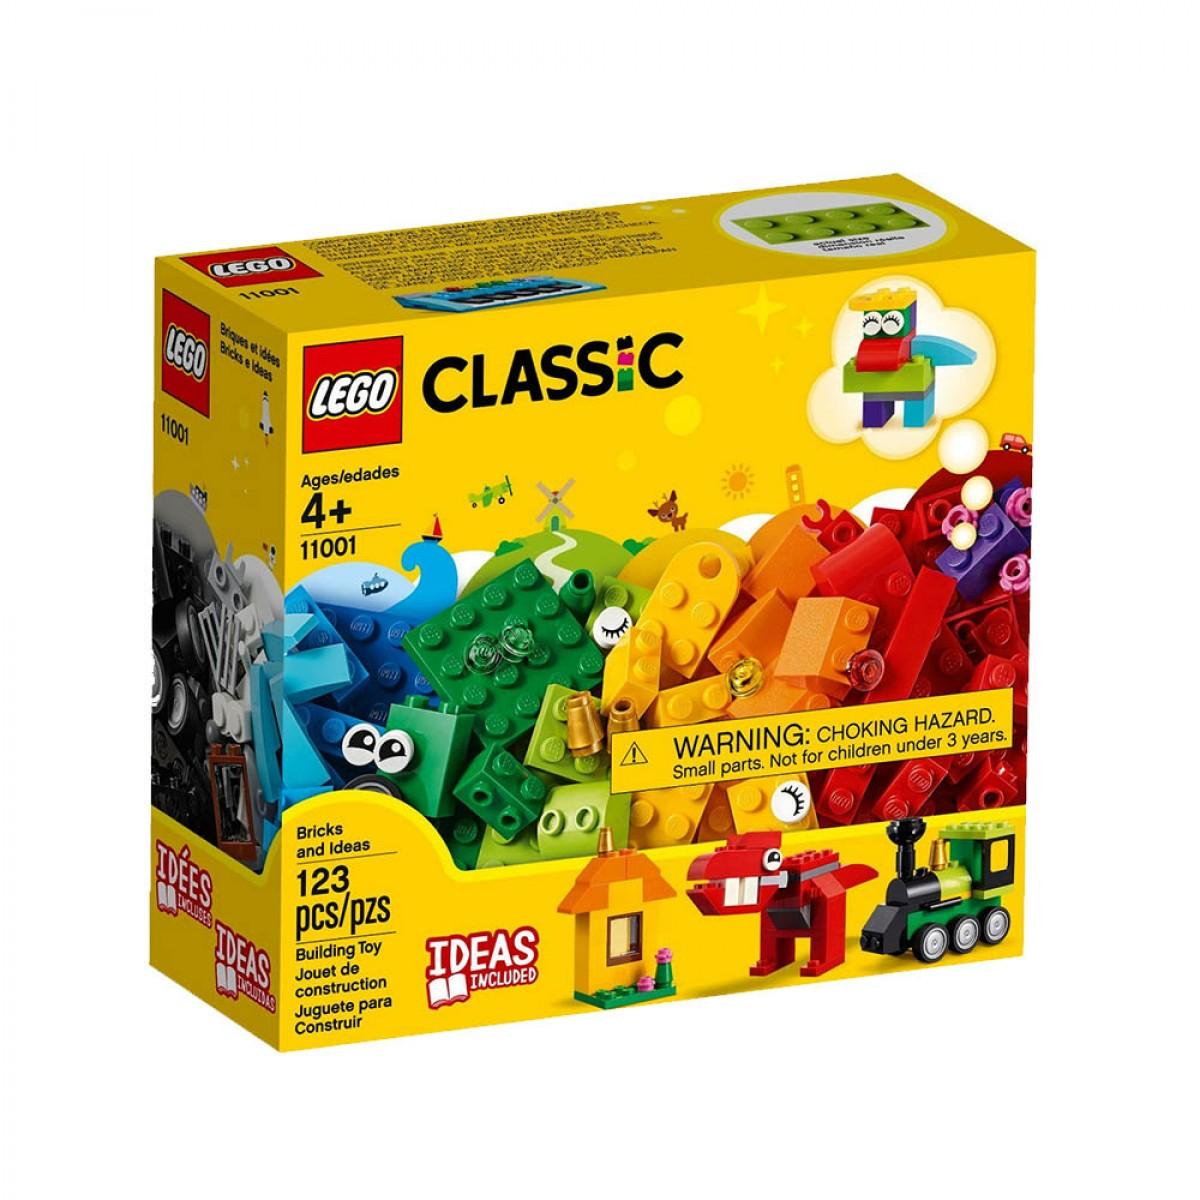 LEGO BRICKS AND IDEAS 11001